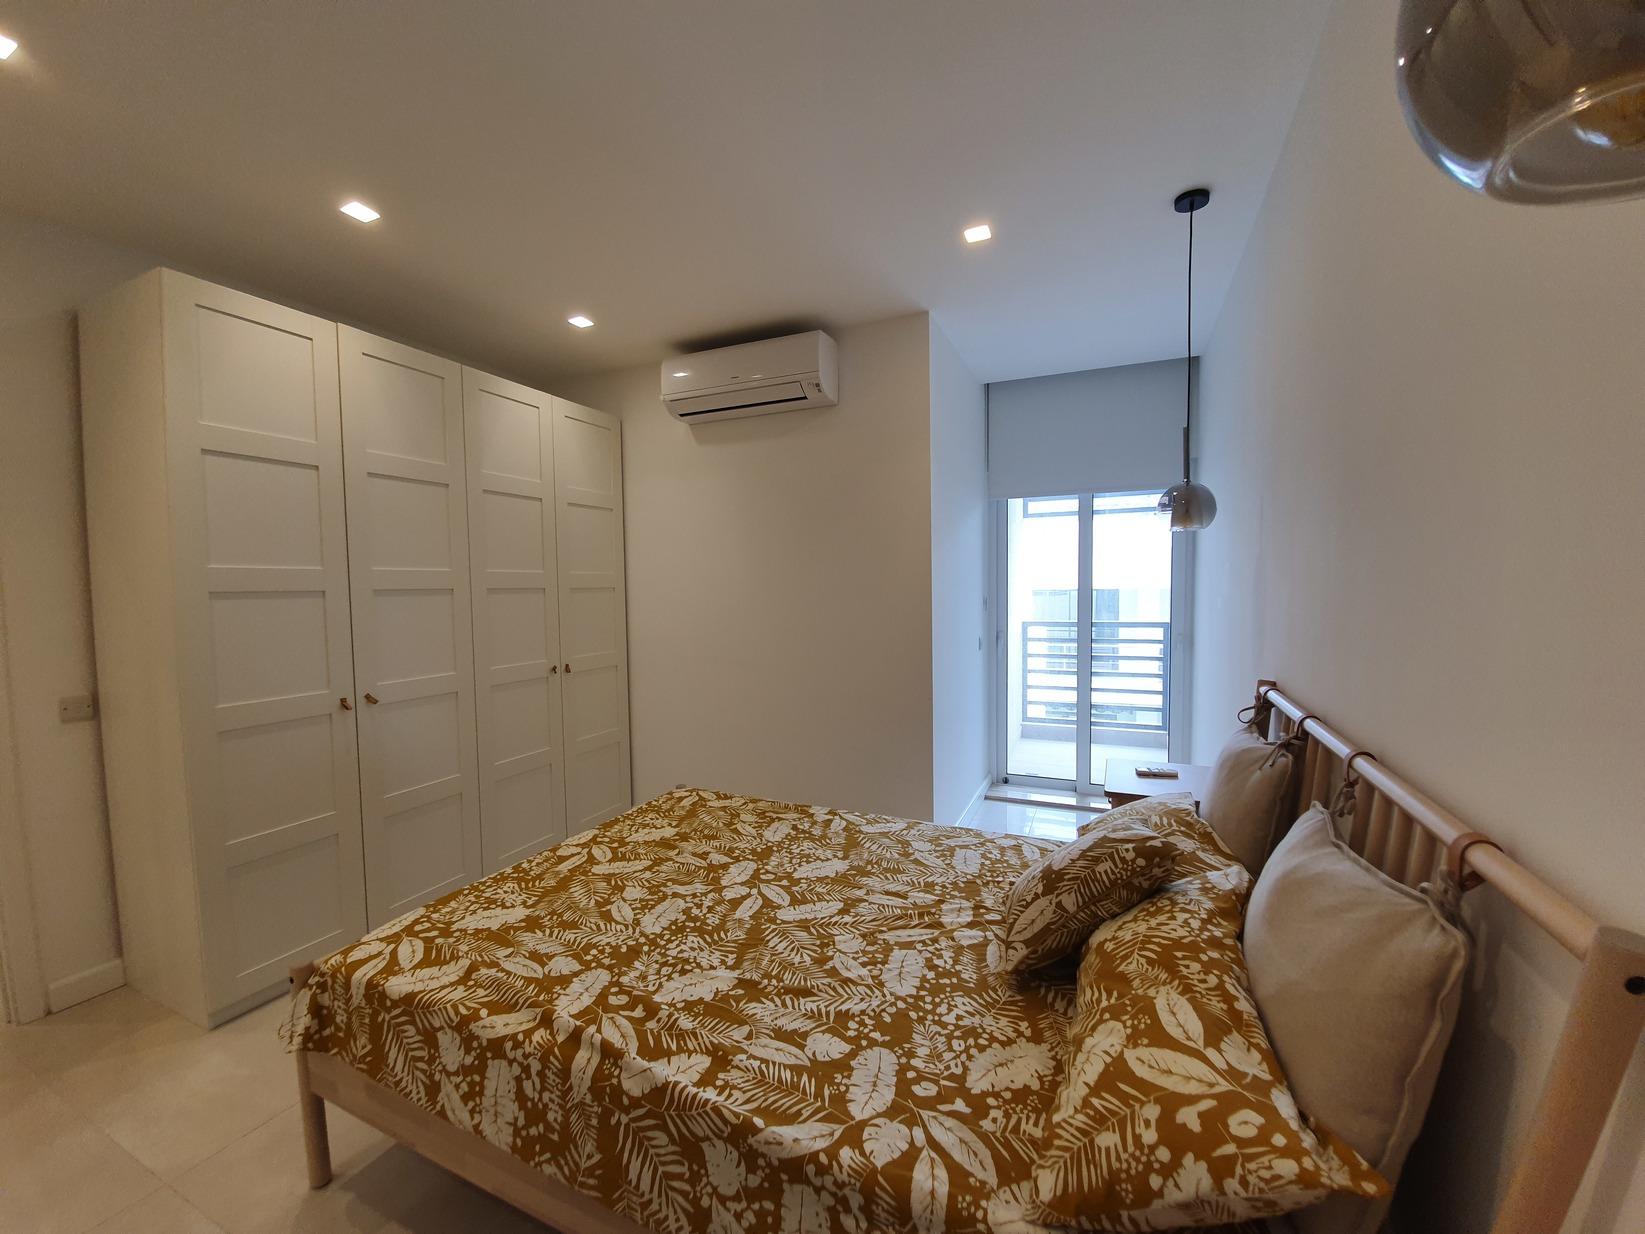 4 bed Apartment For Rent in Sliema, Sliema - thumb 14